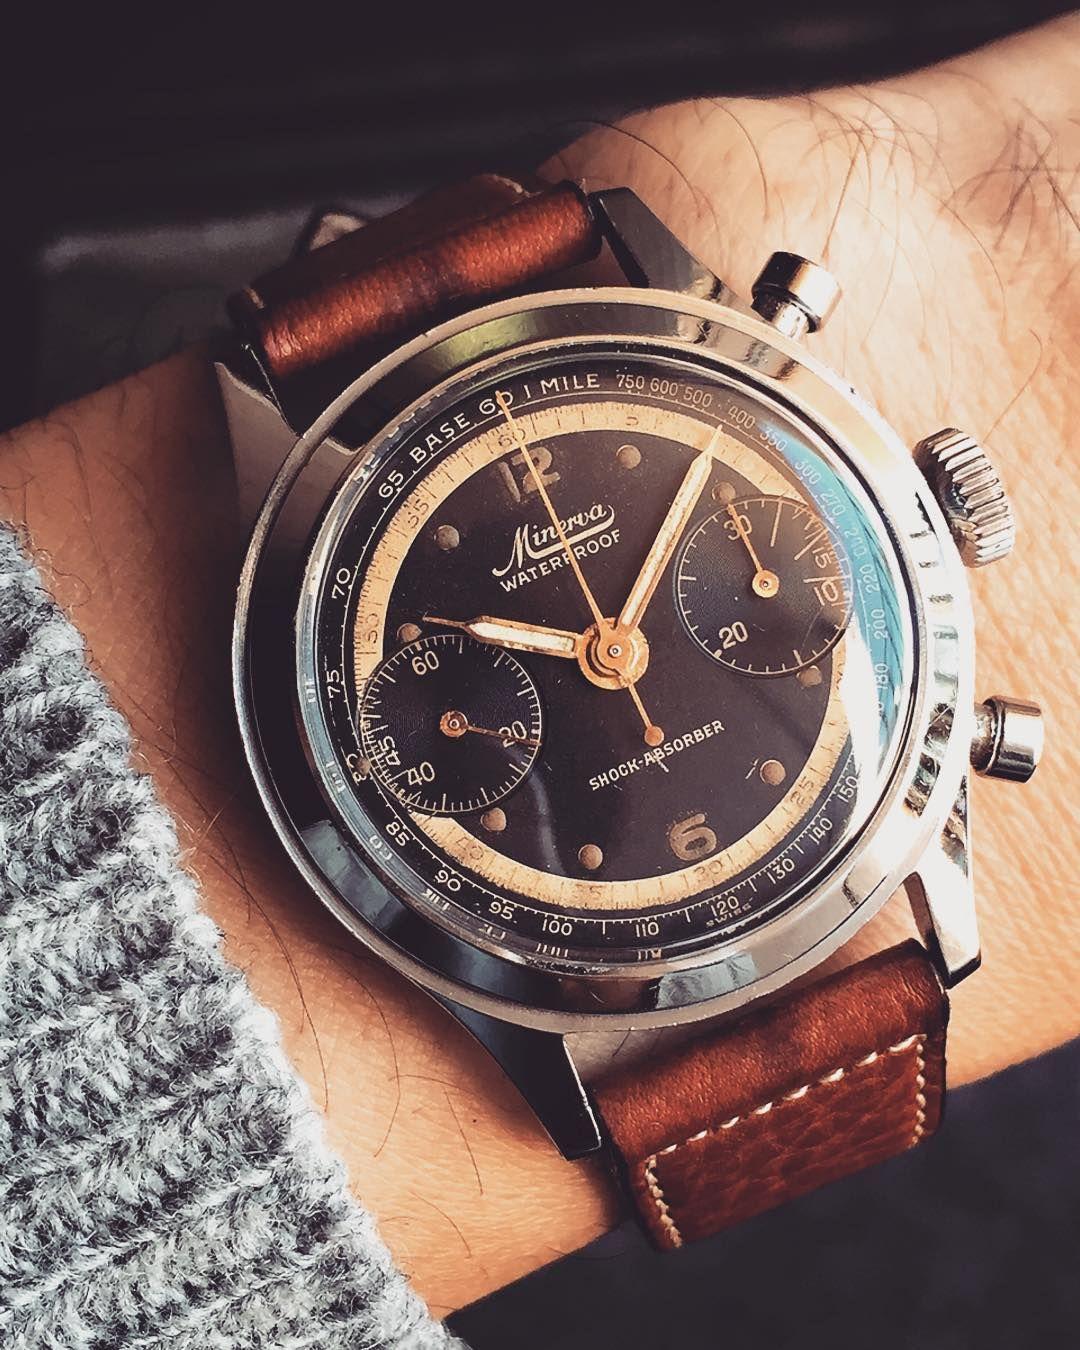 #vintagewatch  #vintageminerva  #vintagestyle  #vintagechronograph